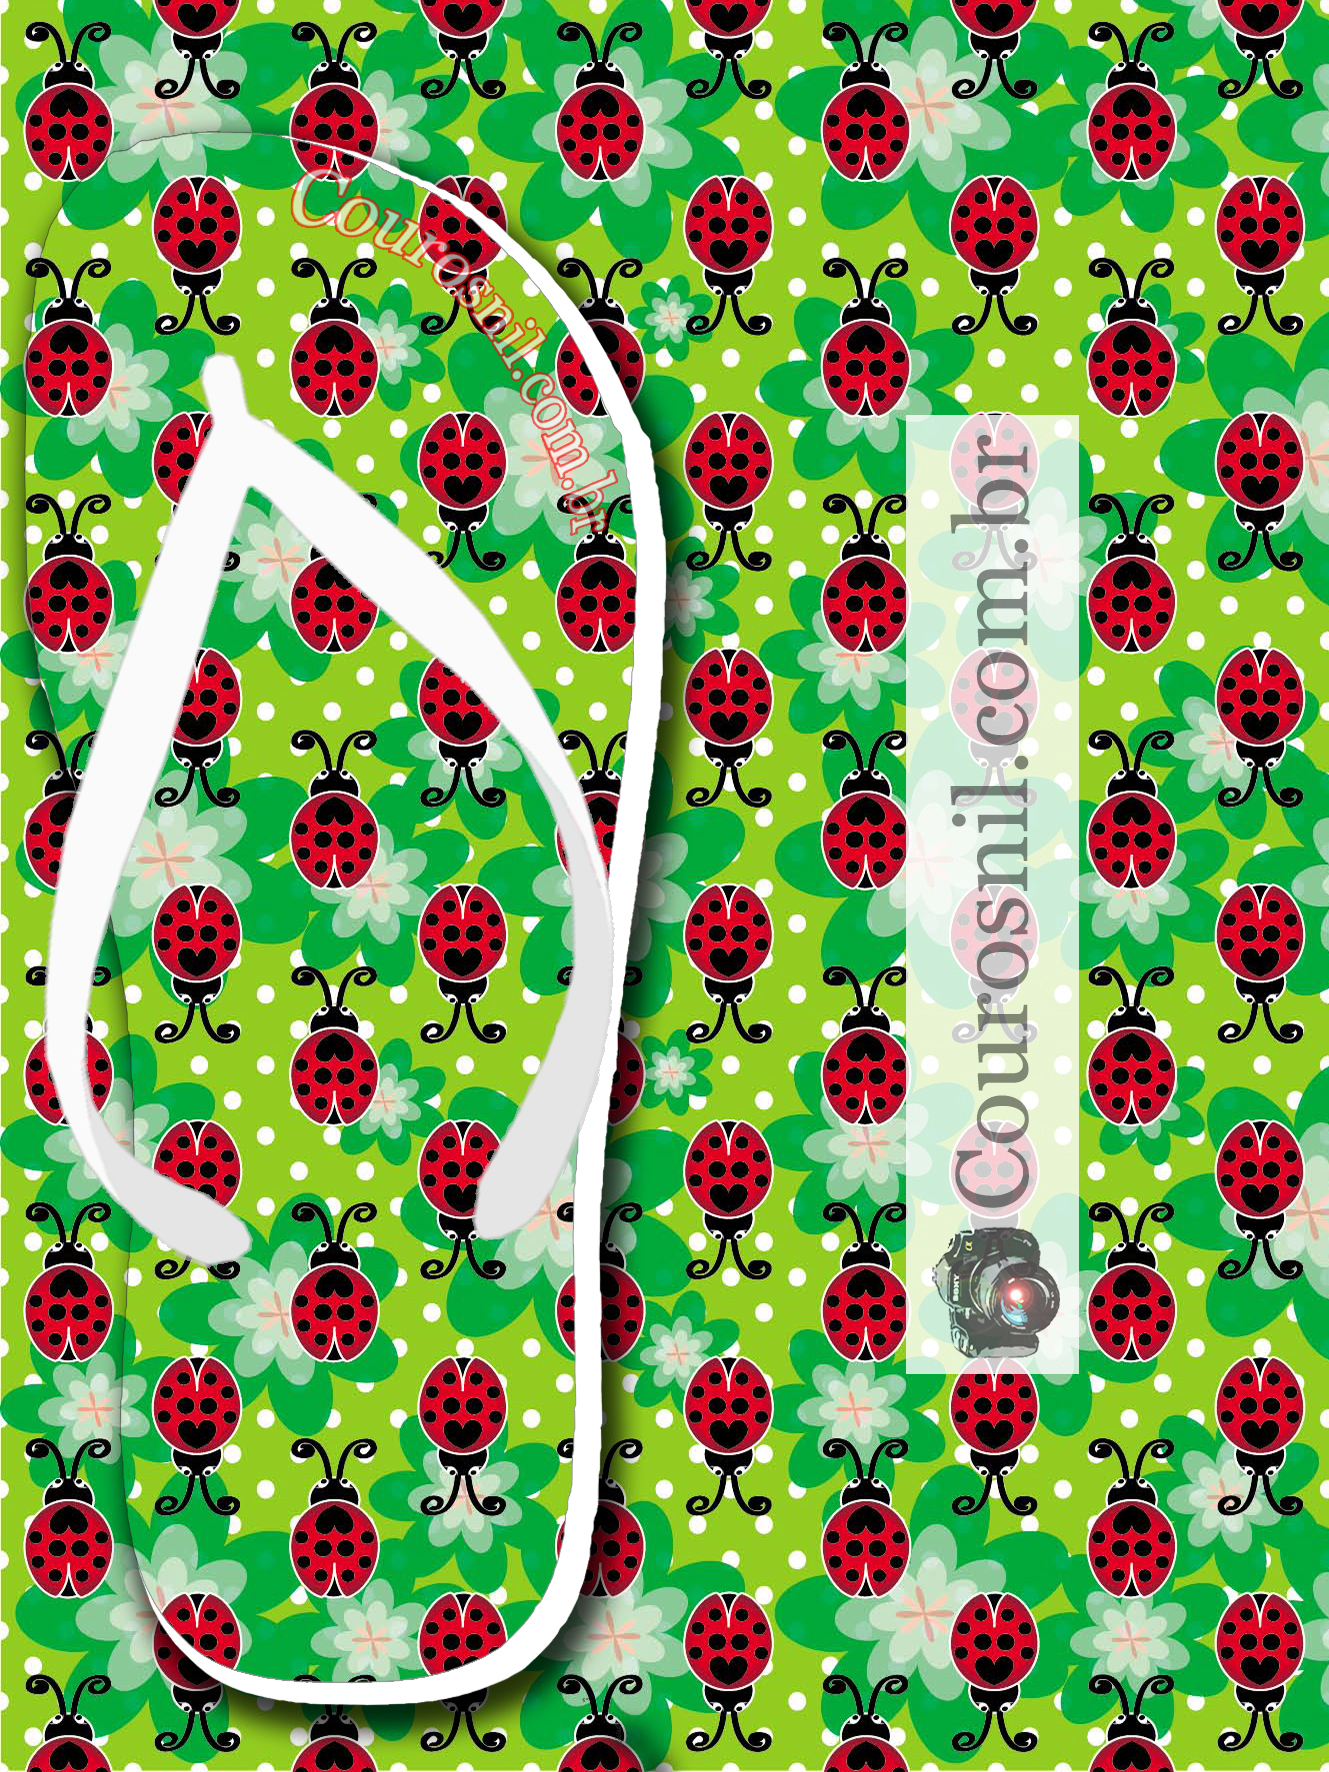 joaninha verde